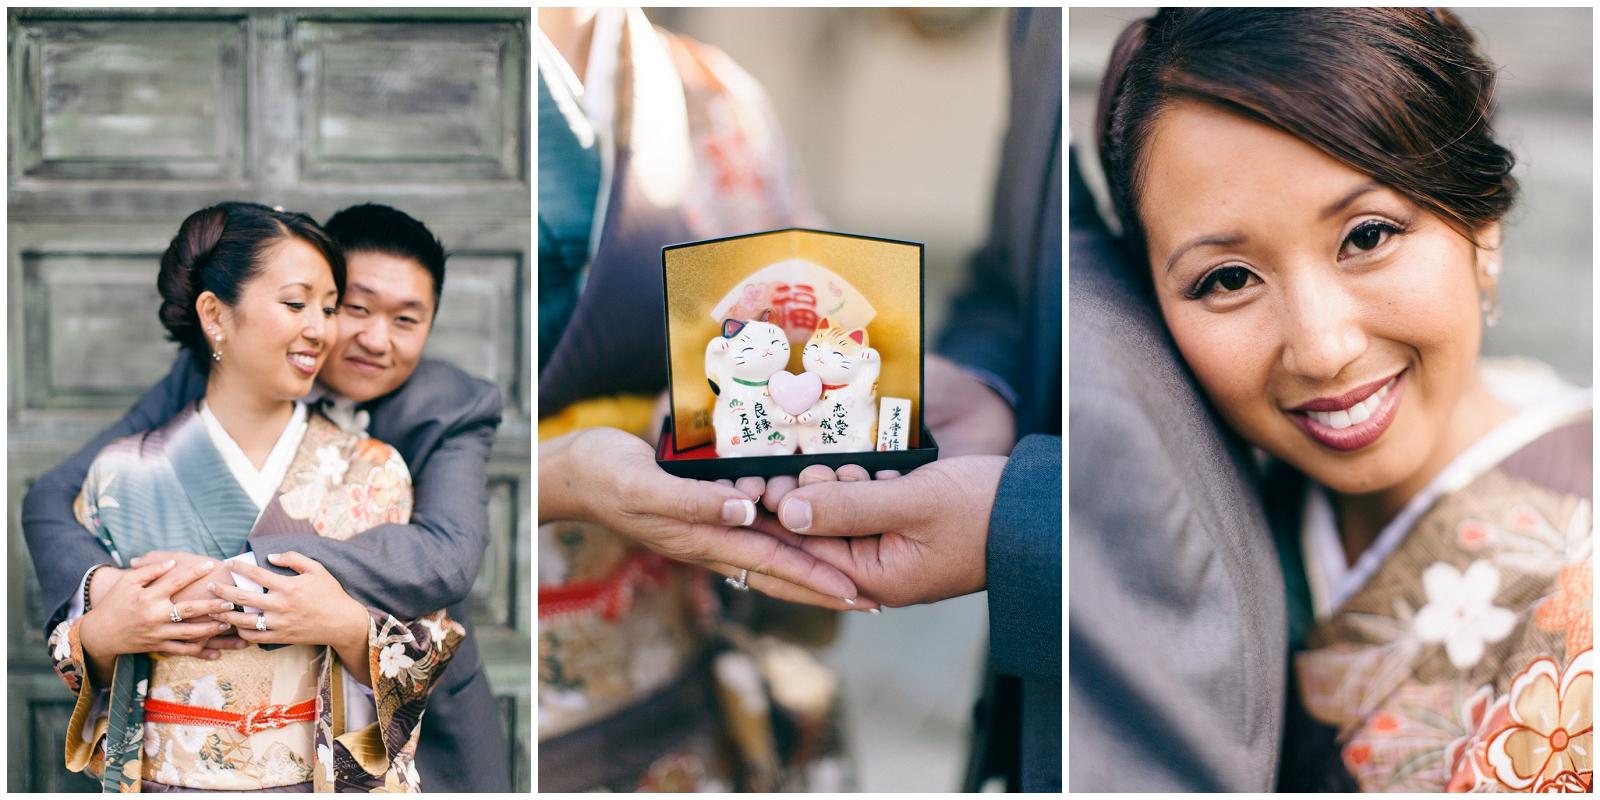 San-Francisco-Bay-Area-Wedding-Photography-Cultural-7.jpg